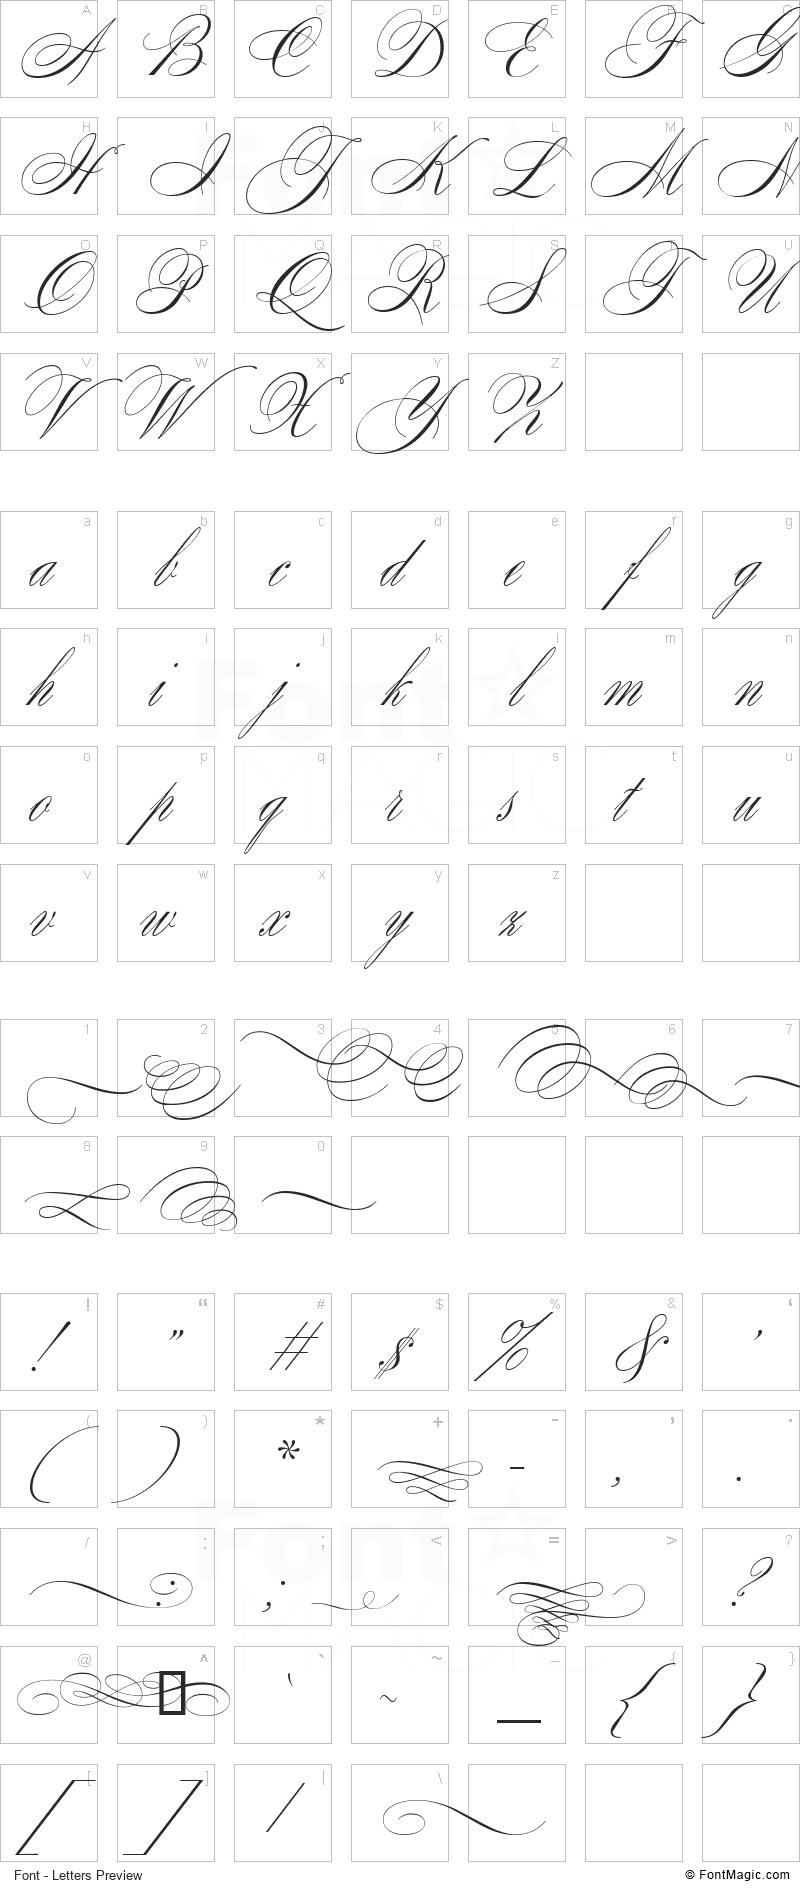 SplendidOrnamenty Font - All Latters Preview Chart